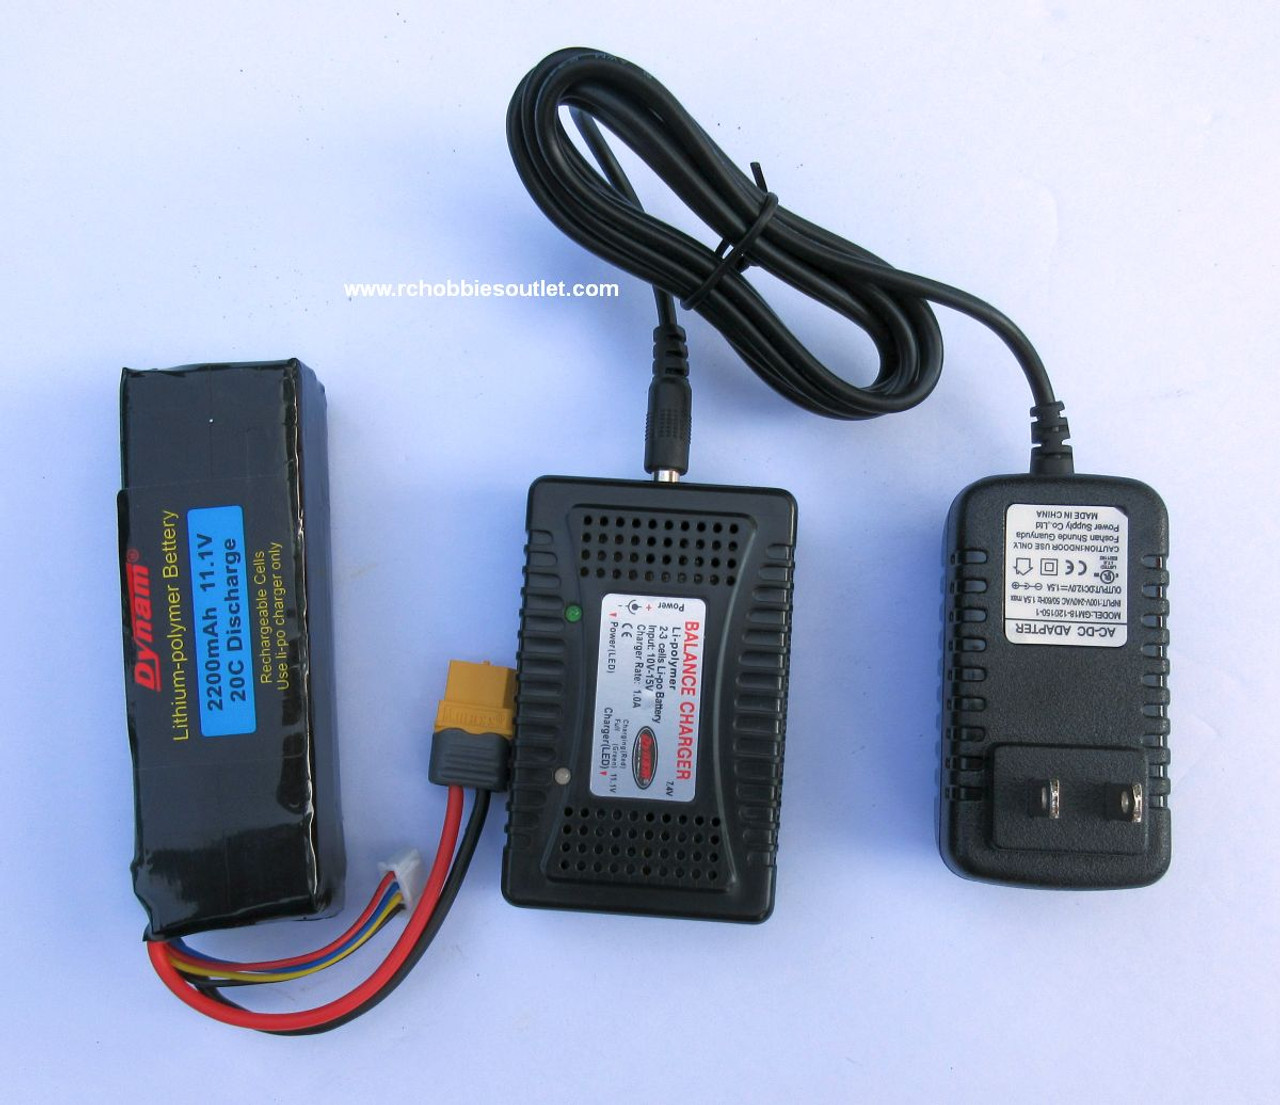 11.1v LIPO Battery and 1 Amp balanced charger